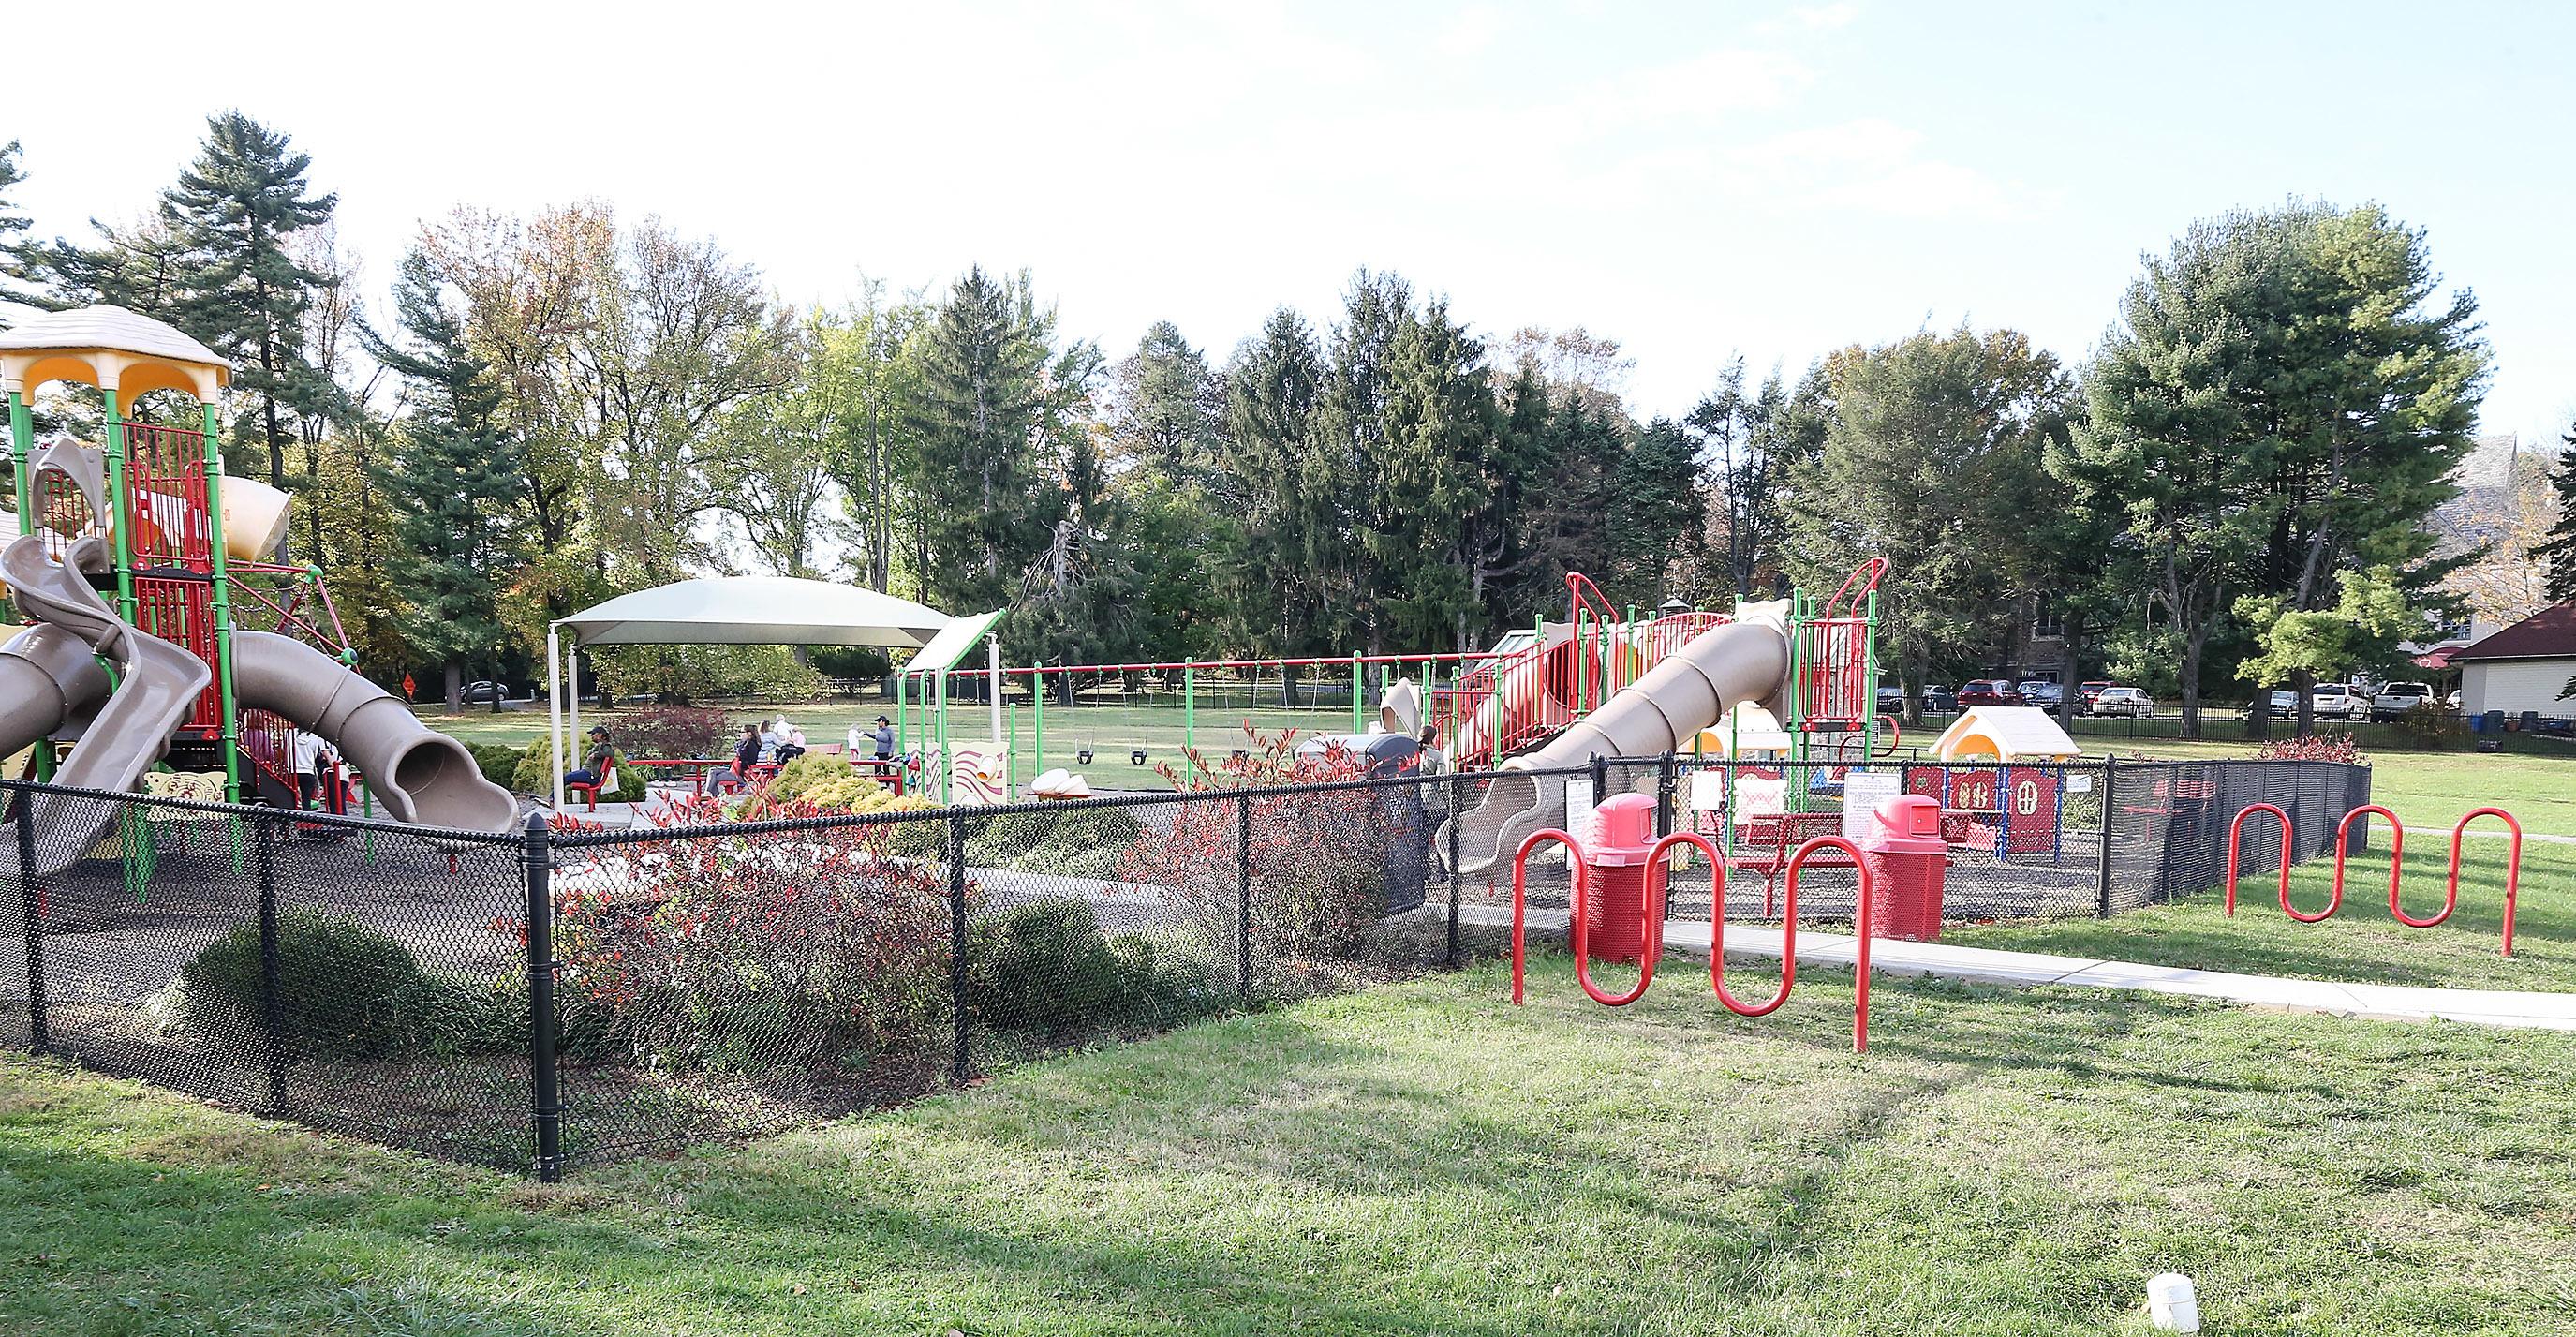 Ashbridge Park playground. Wednesday, October 25, 2017. STEVEN M. FALK / Staff Photographer